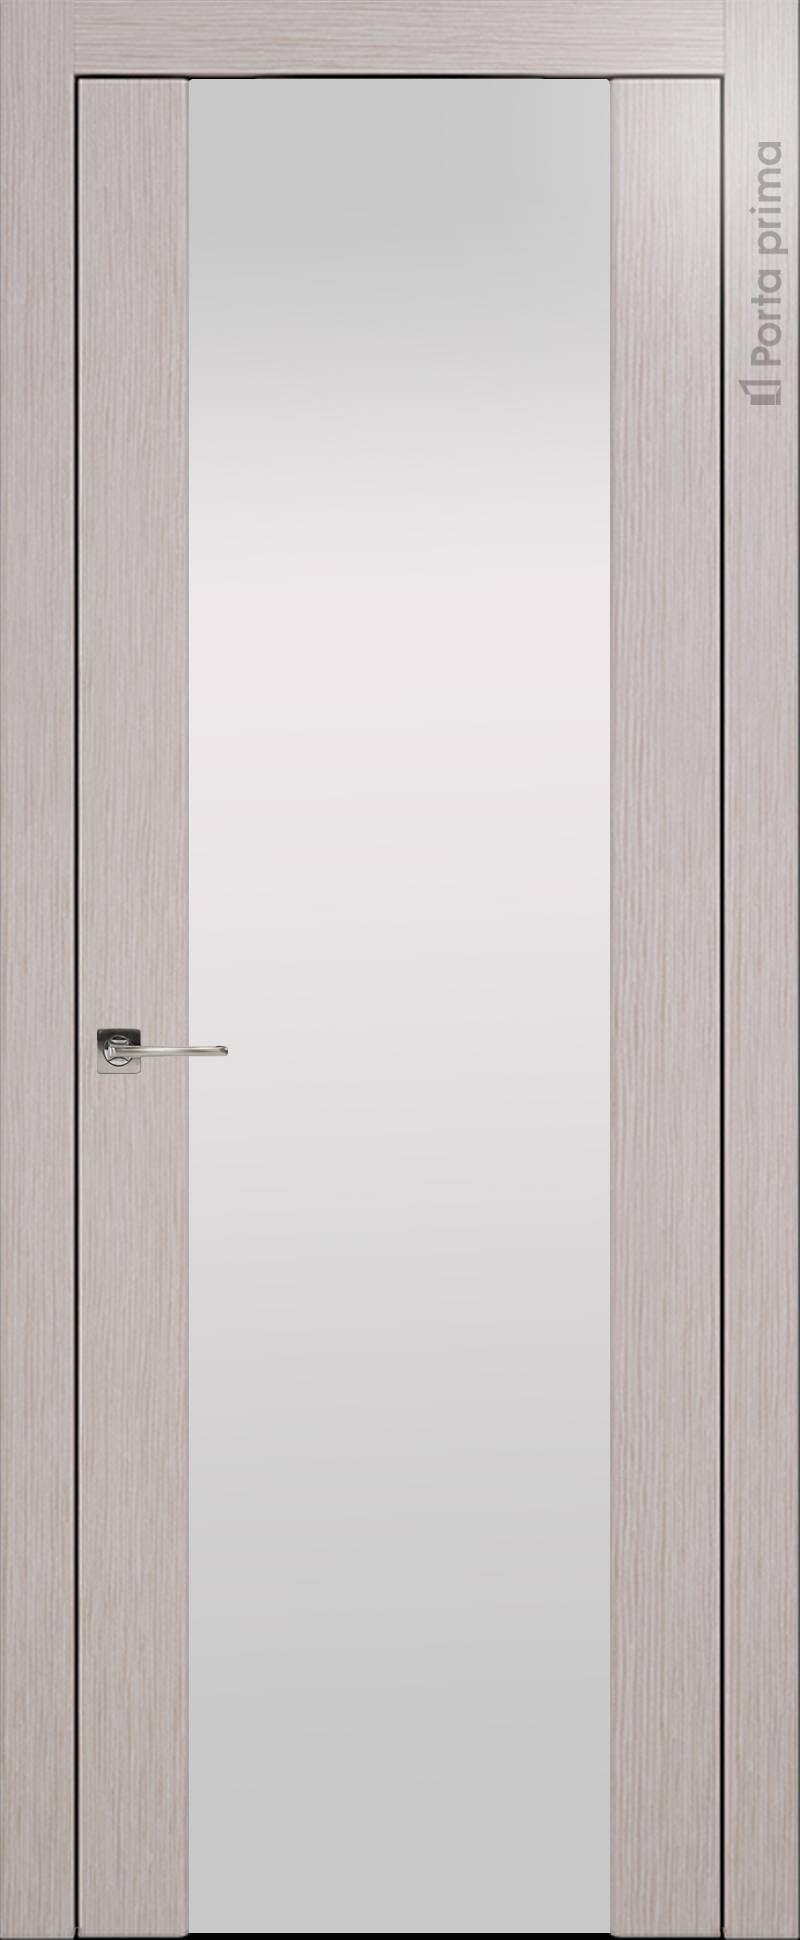 Torino цвет - Дымчатый дуб Со стеклом (ДО)